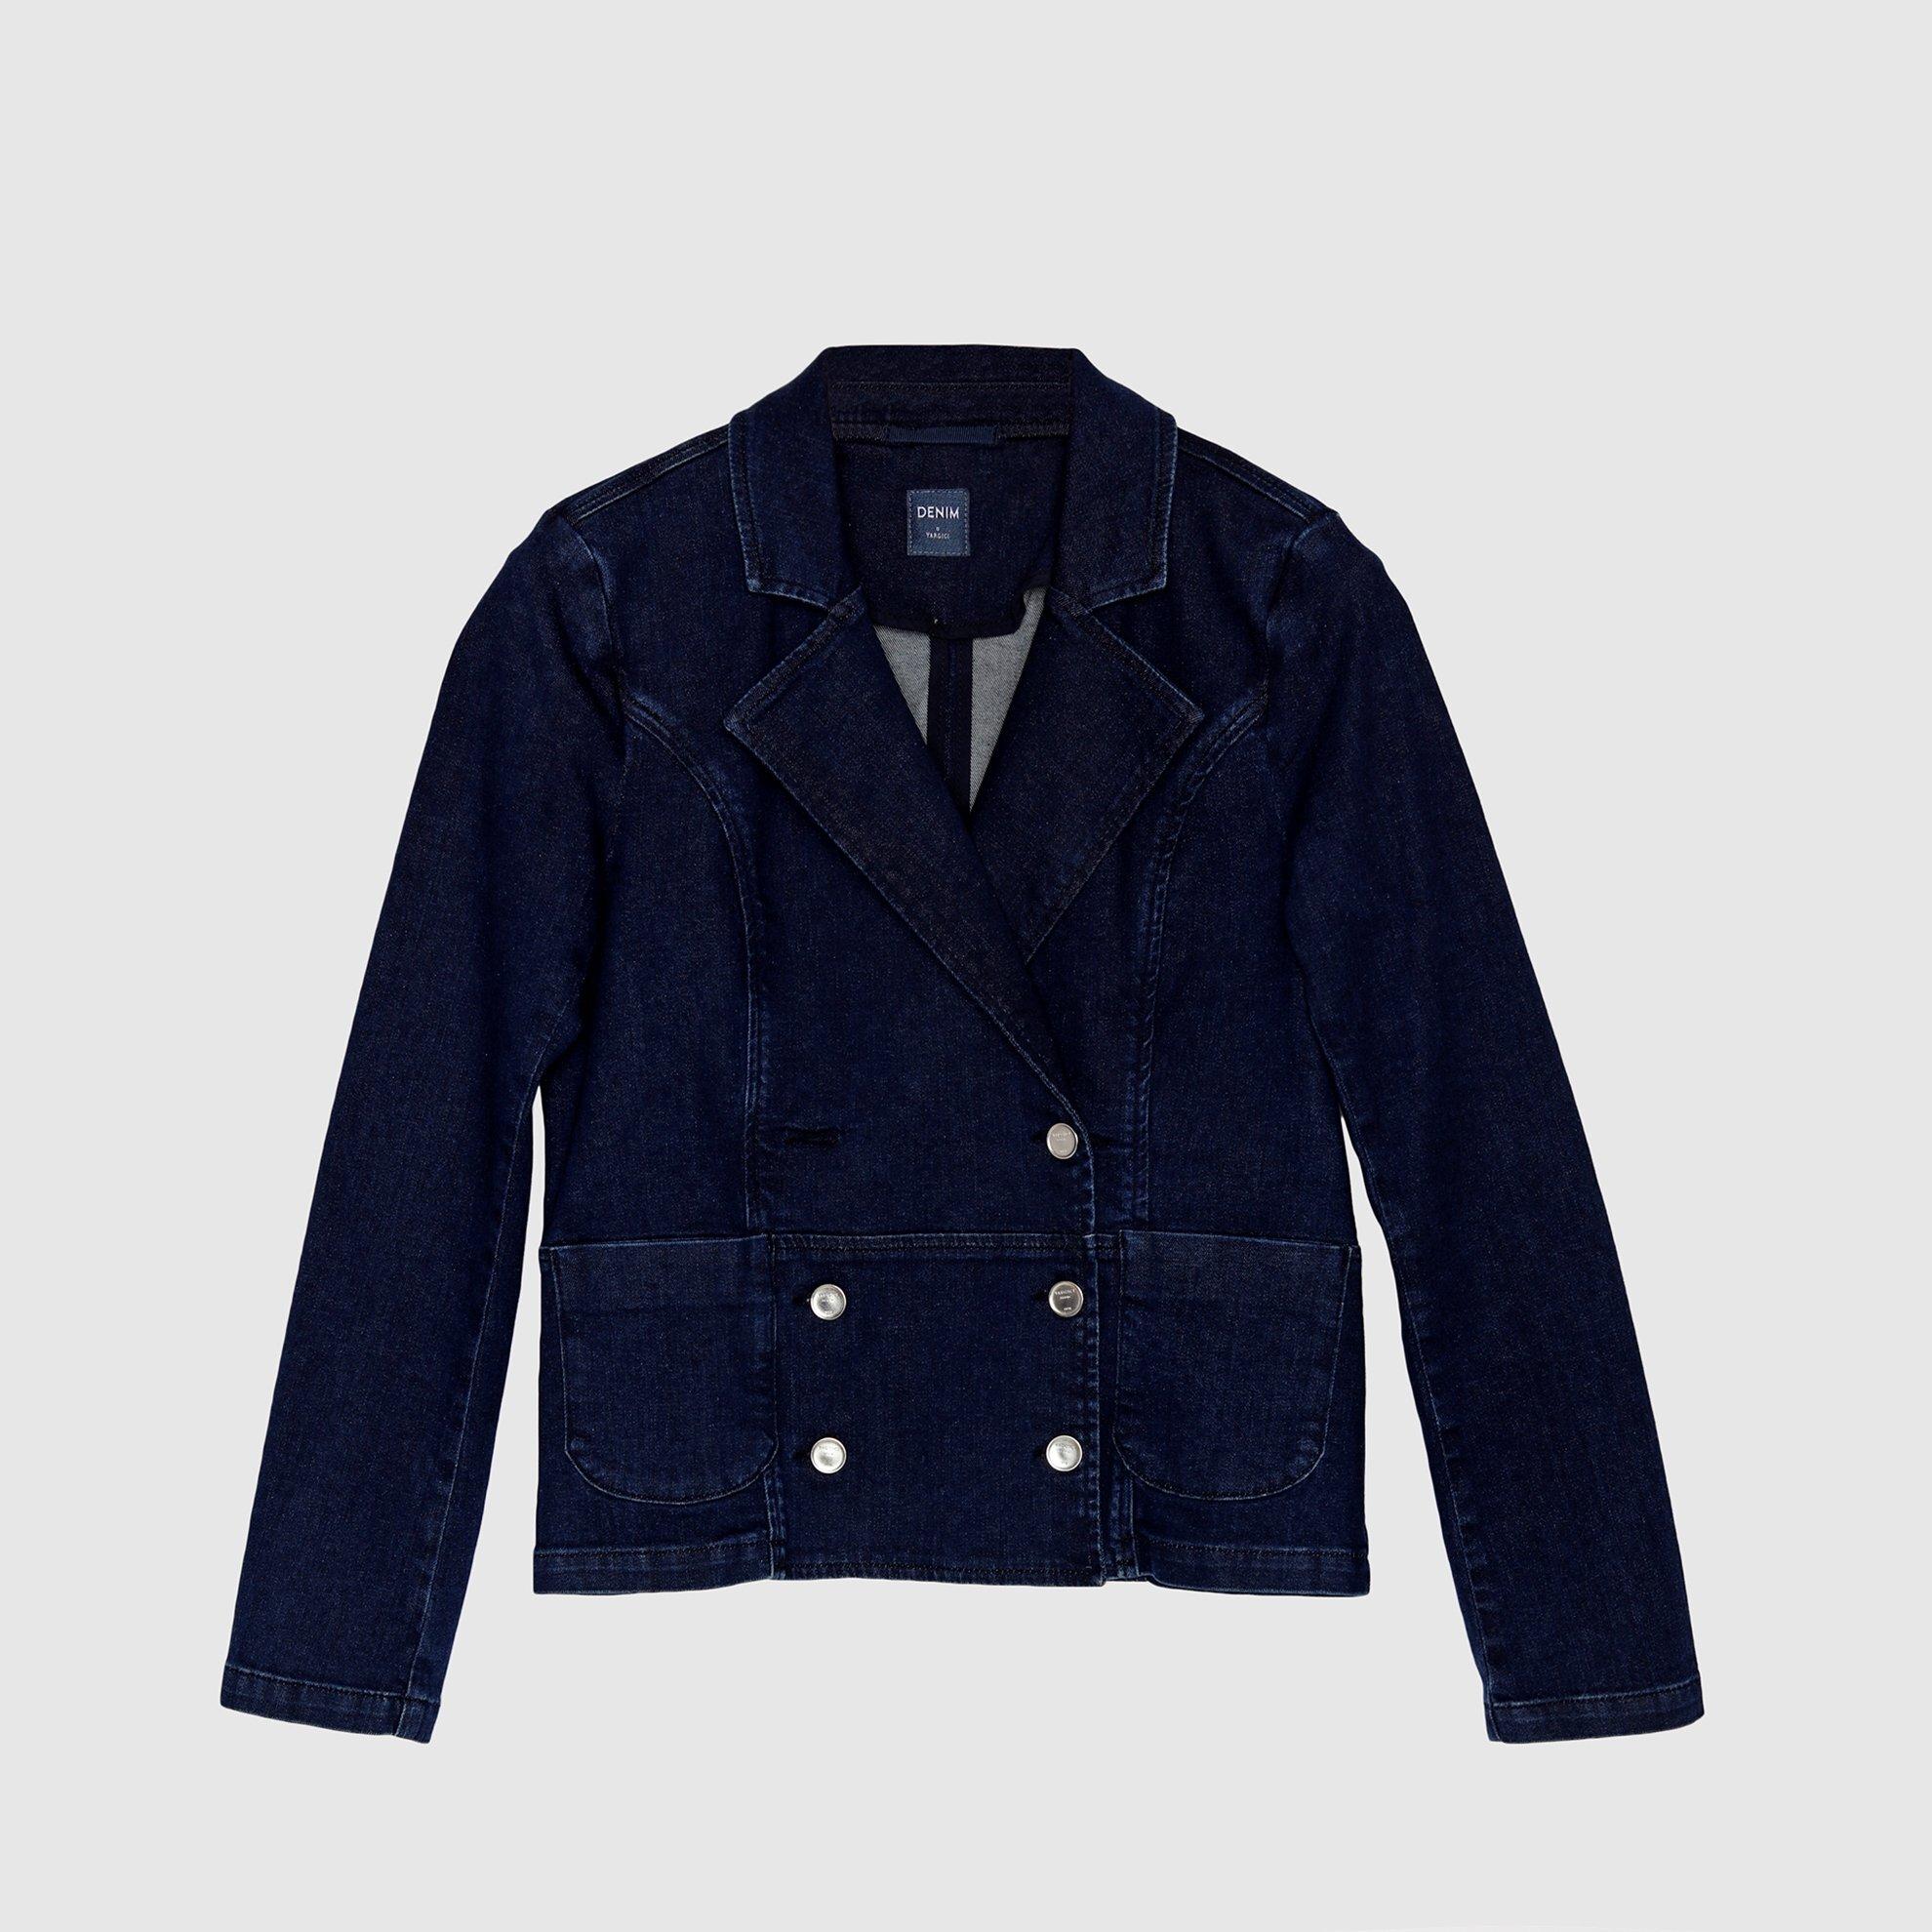 Jeansjacke in indigo-Blau